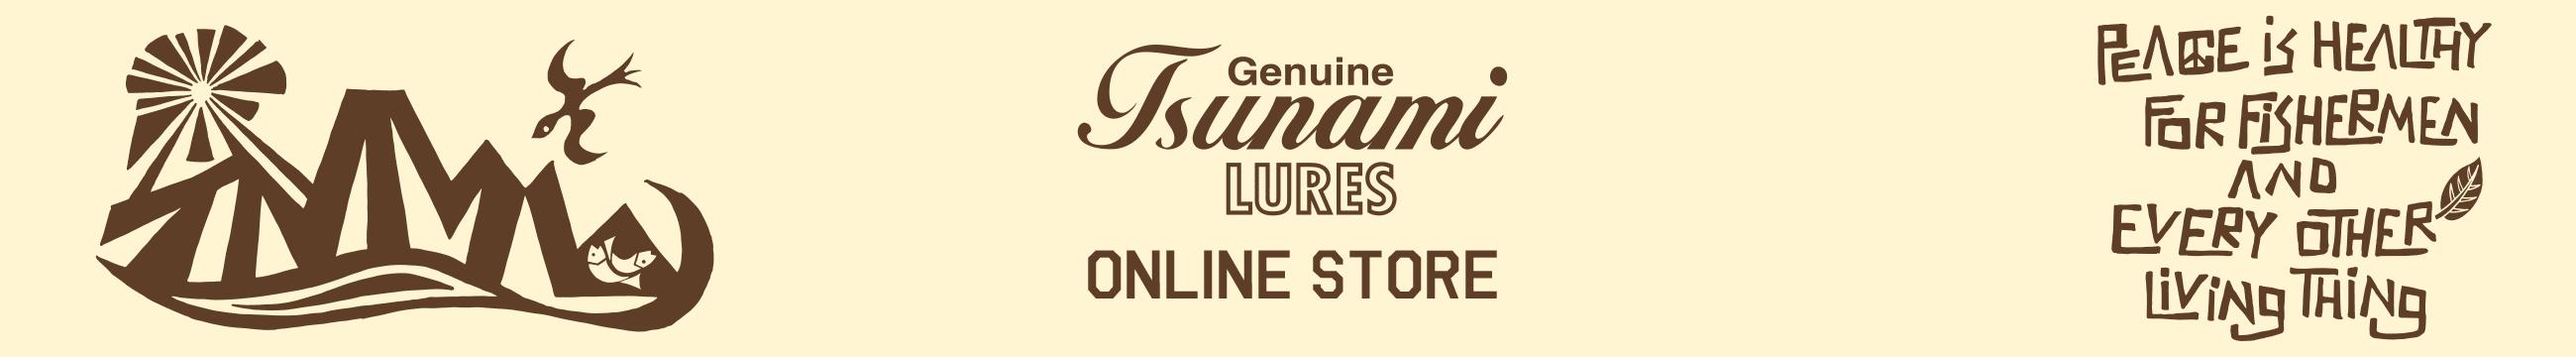 Tsunami Lures Online Shop